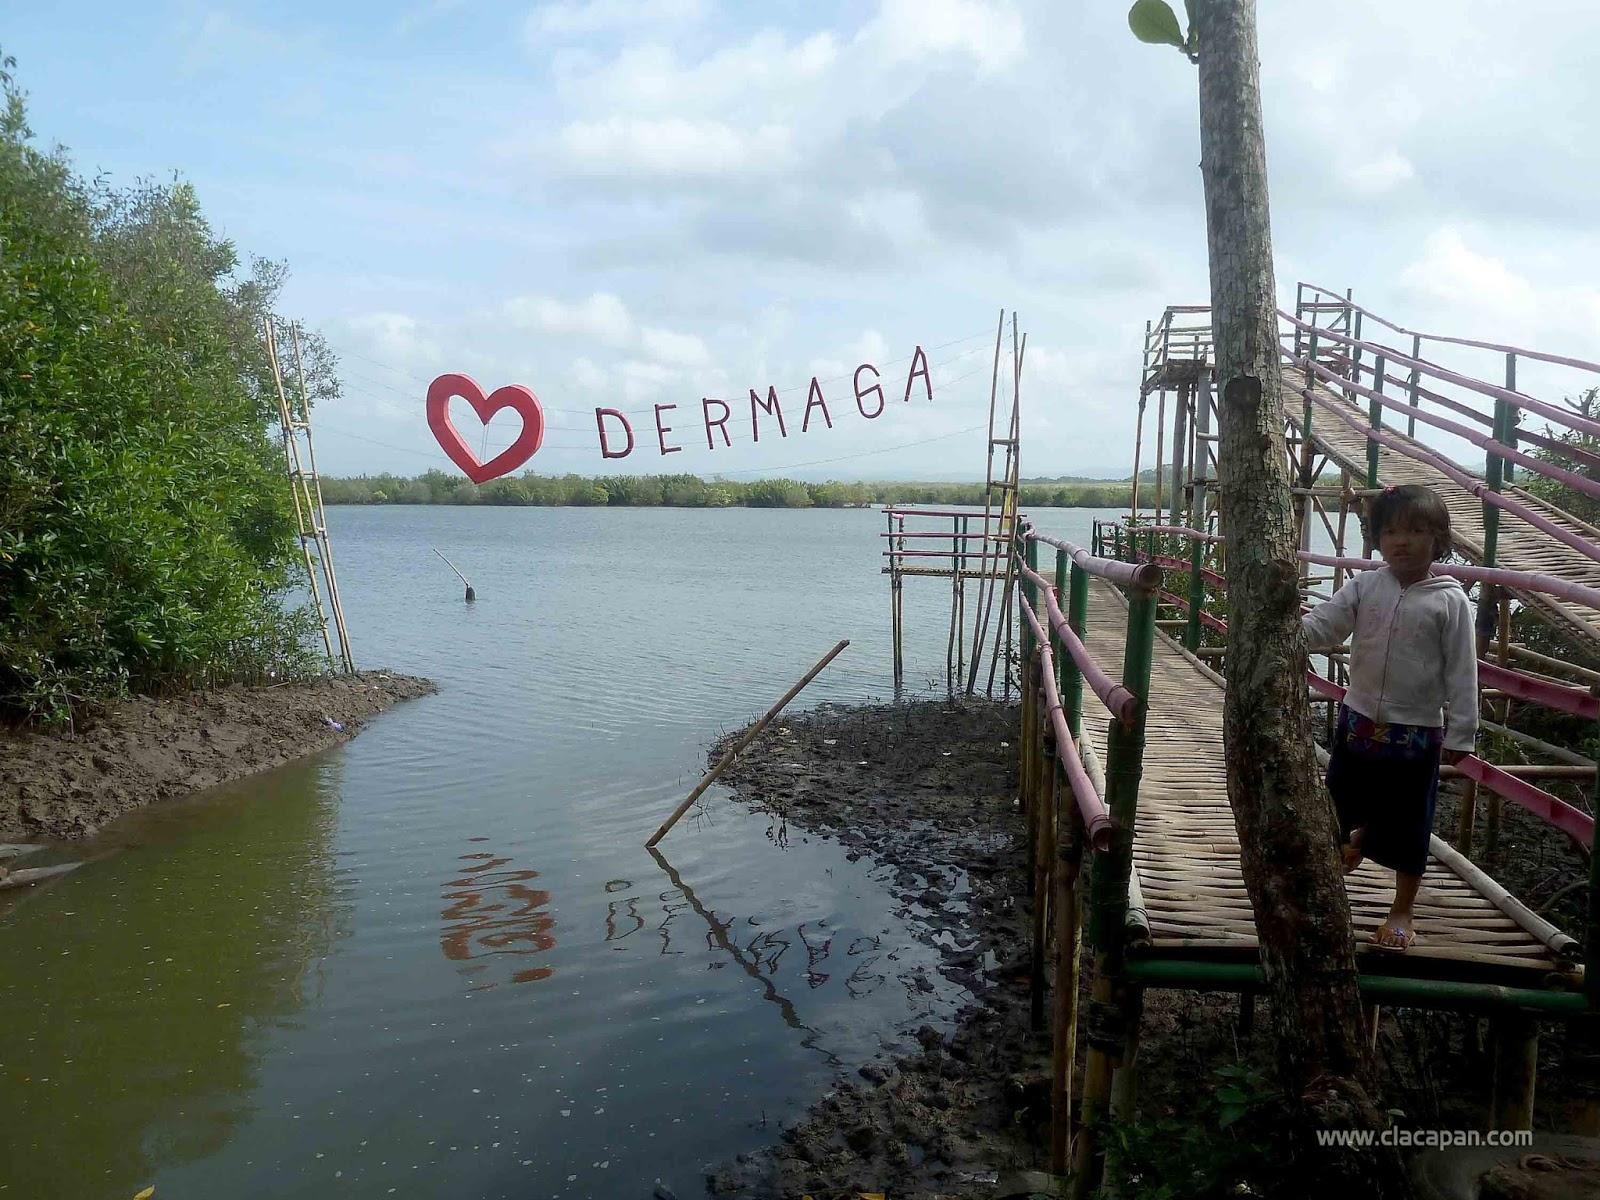 Wisata Hutan Payau Keindahannya Hampir Terlupakan Yuk Dermaga Cinta Menara